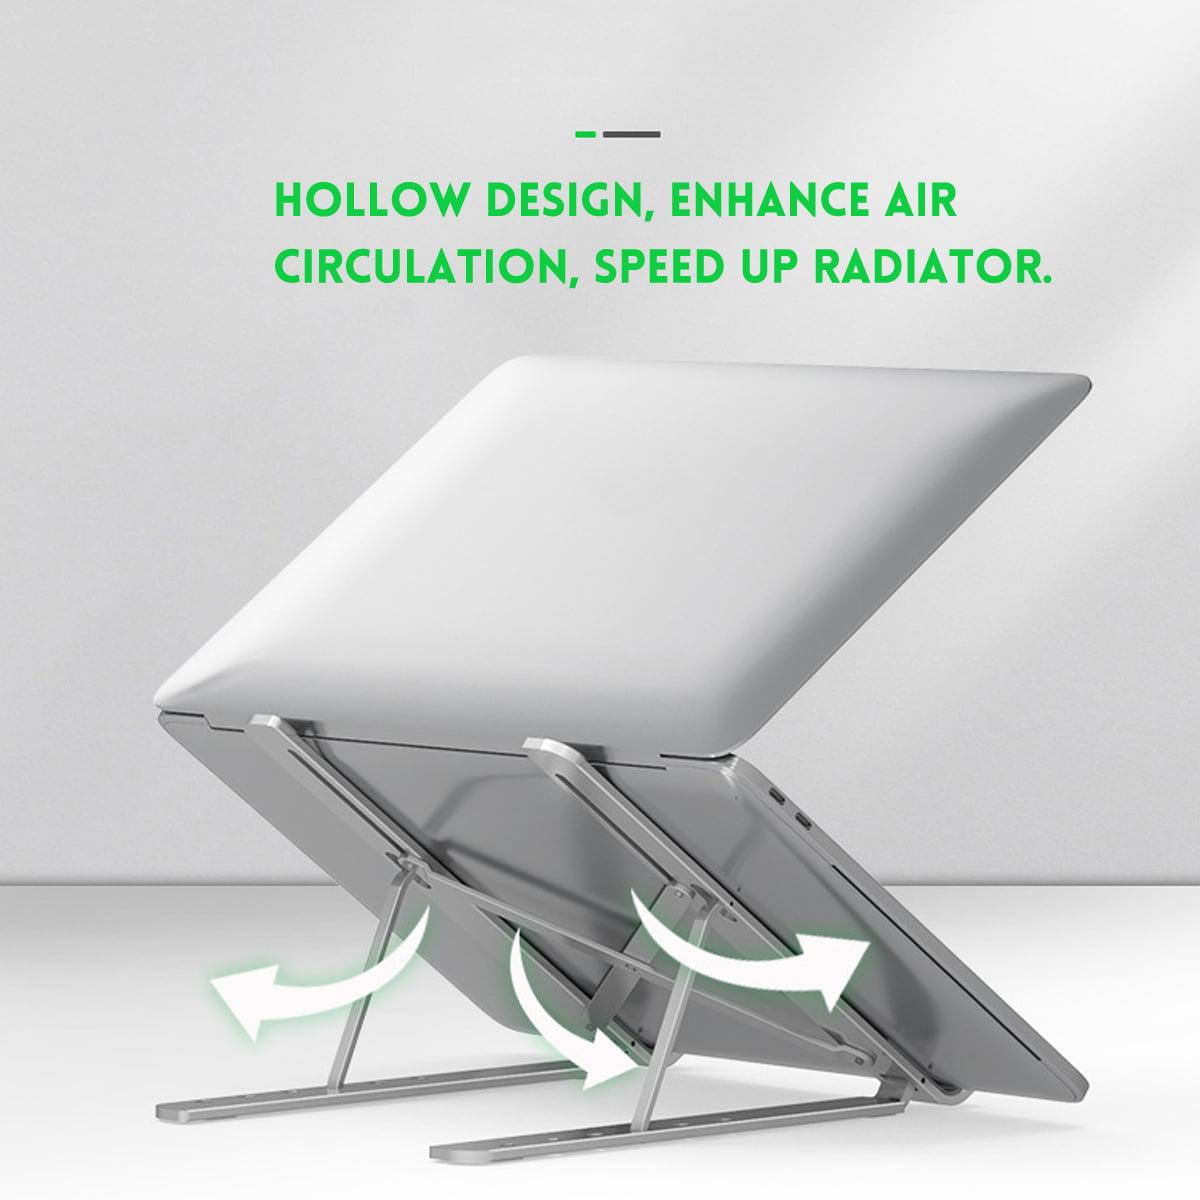 Portable Folding Laptop Stand For Desk Adjustable Height Laptop Cooling Stand Holder Notebook For 11 17inch Tablet Pc Walmart Com Walmart Com